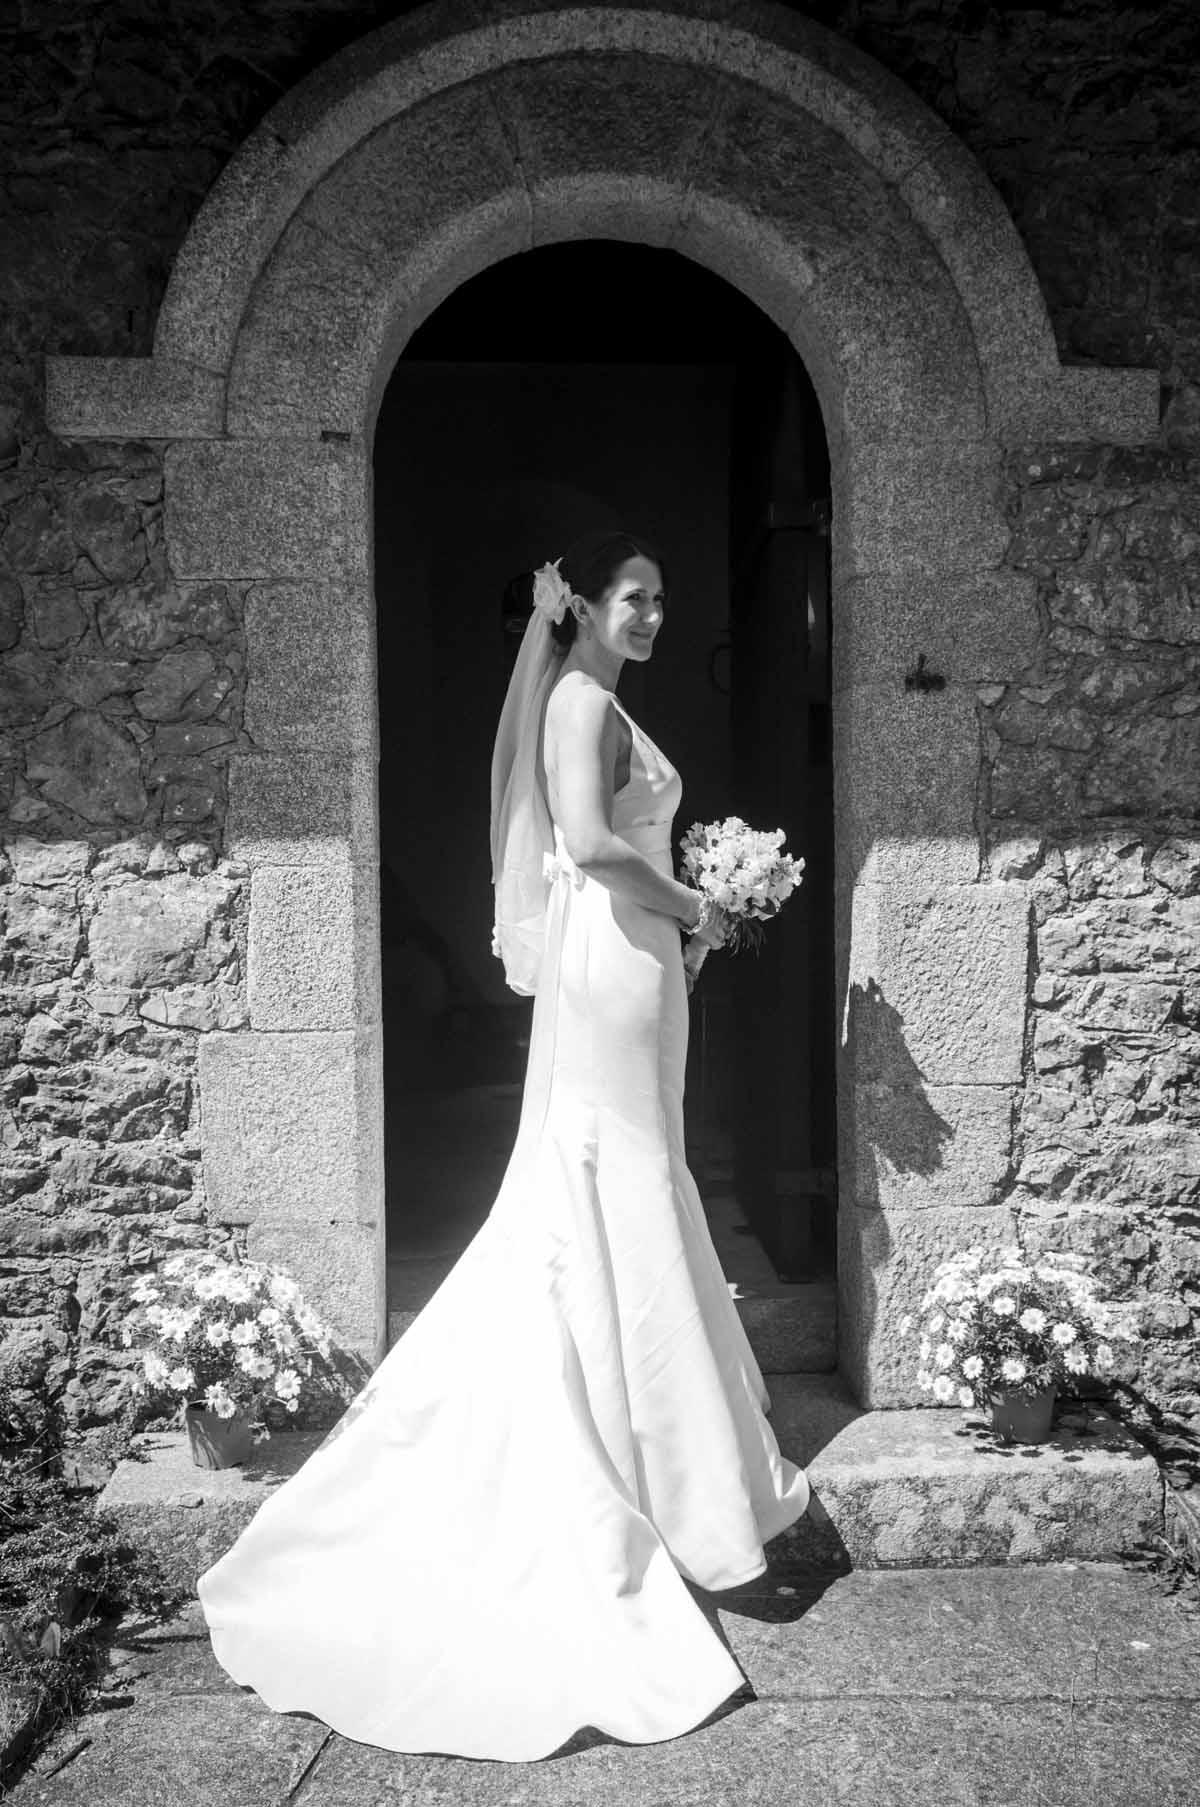 A Country Church Wedding Photo